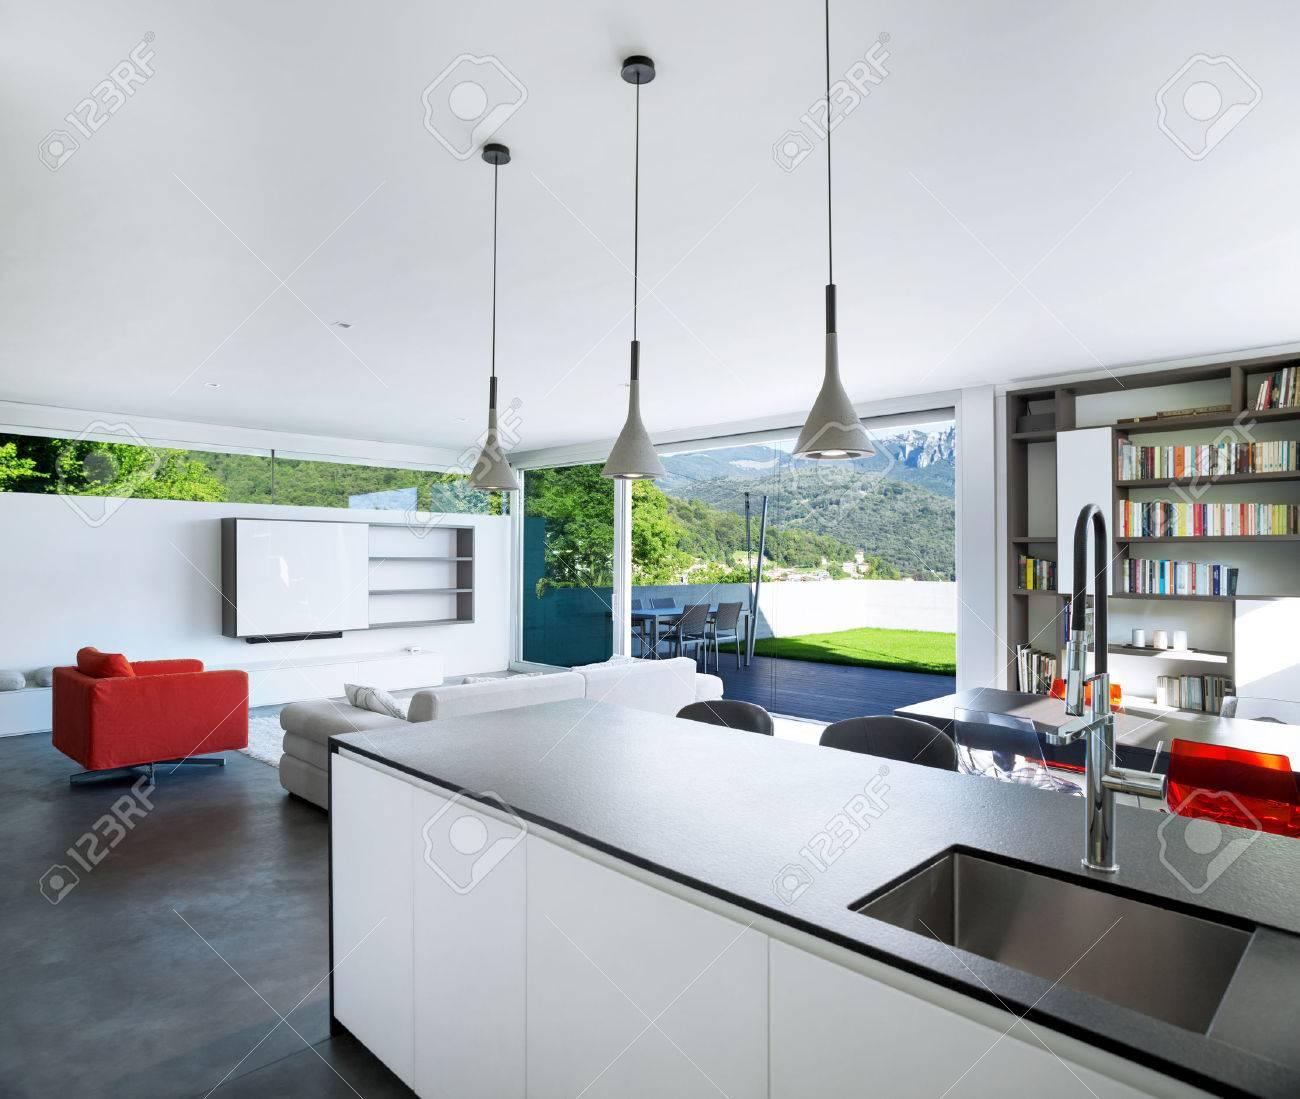 https://previews.123rf.com/images/piovesempre/piovesempre1409/piovesempre140900019/31625689-design-d-int%C3%A9rieur-appartement-moderne-cuisine.jpg